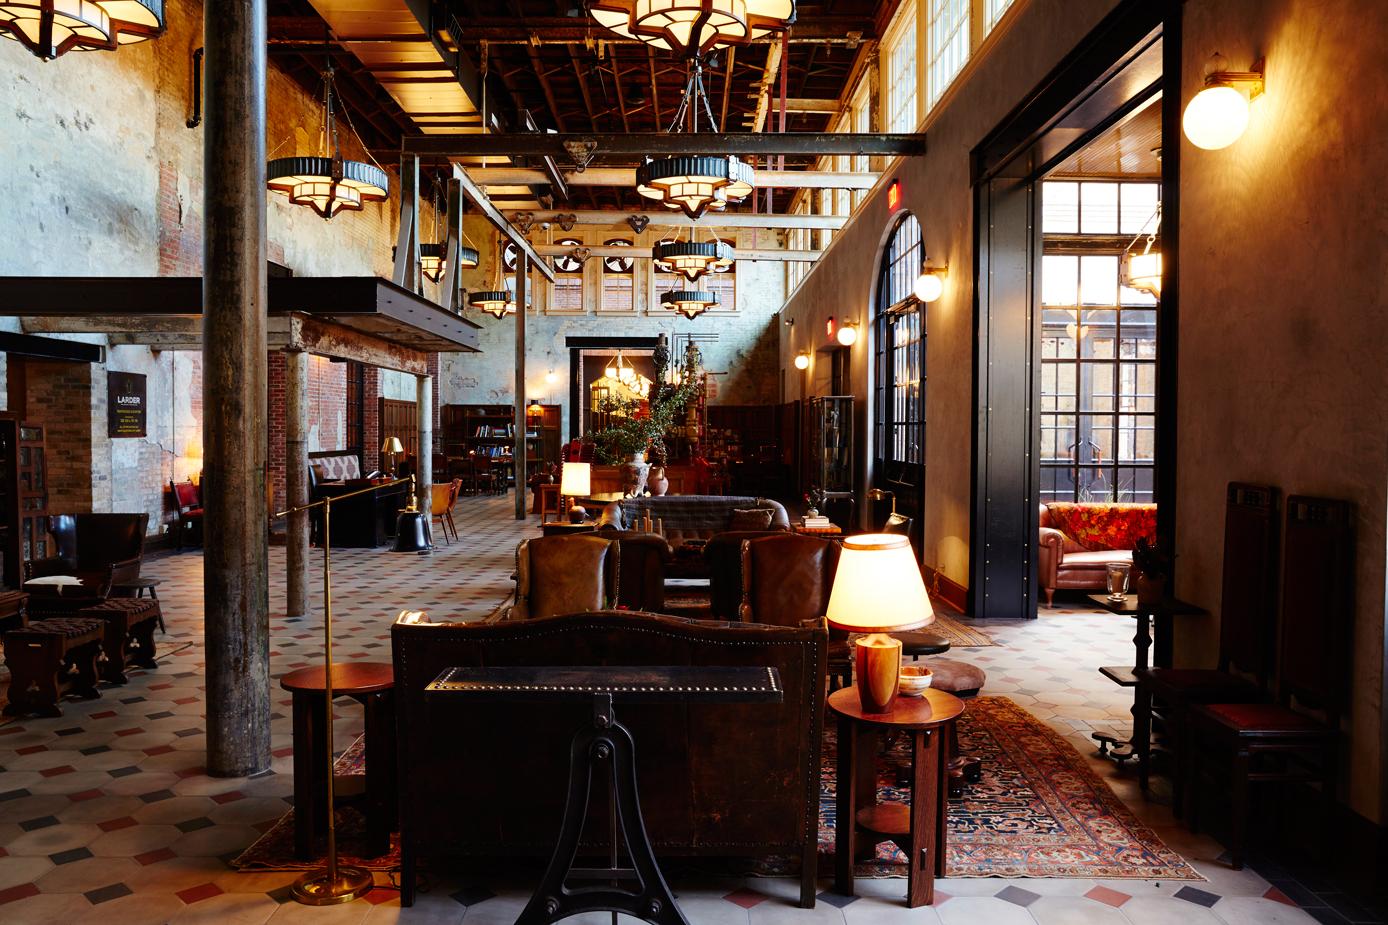 HOTEL-EMMA_LOBBY_NICOLE-FRANZEN_0206-(16)_web.jpg